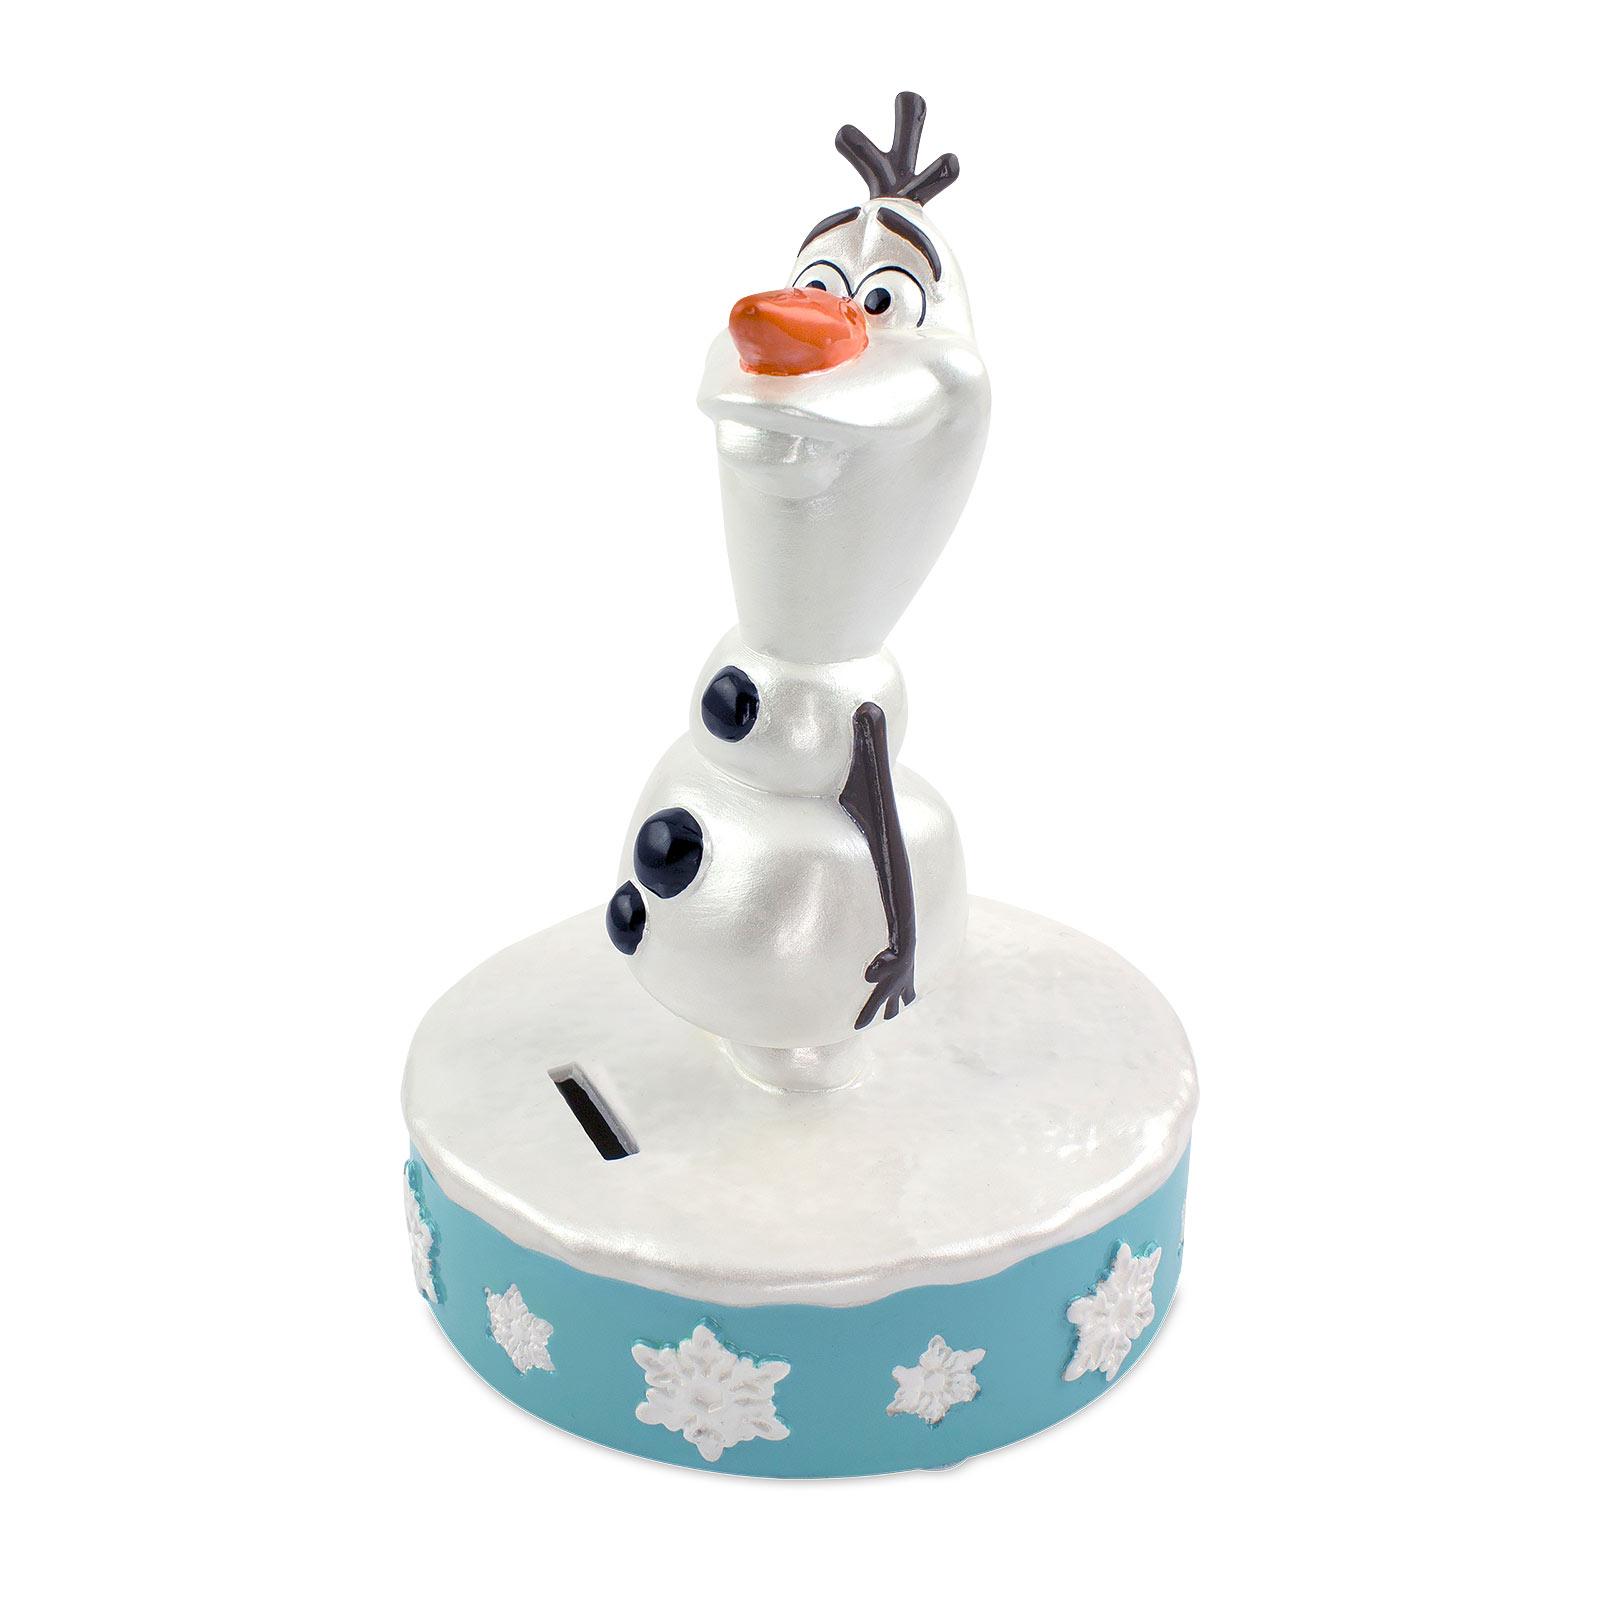 Frozen - Olaf Spardose